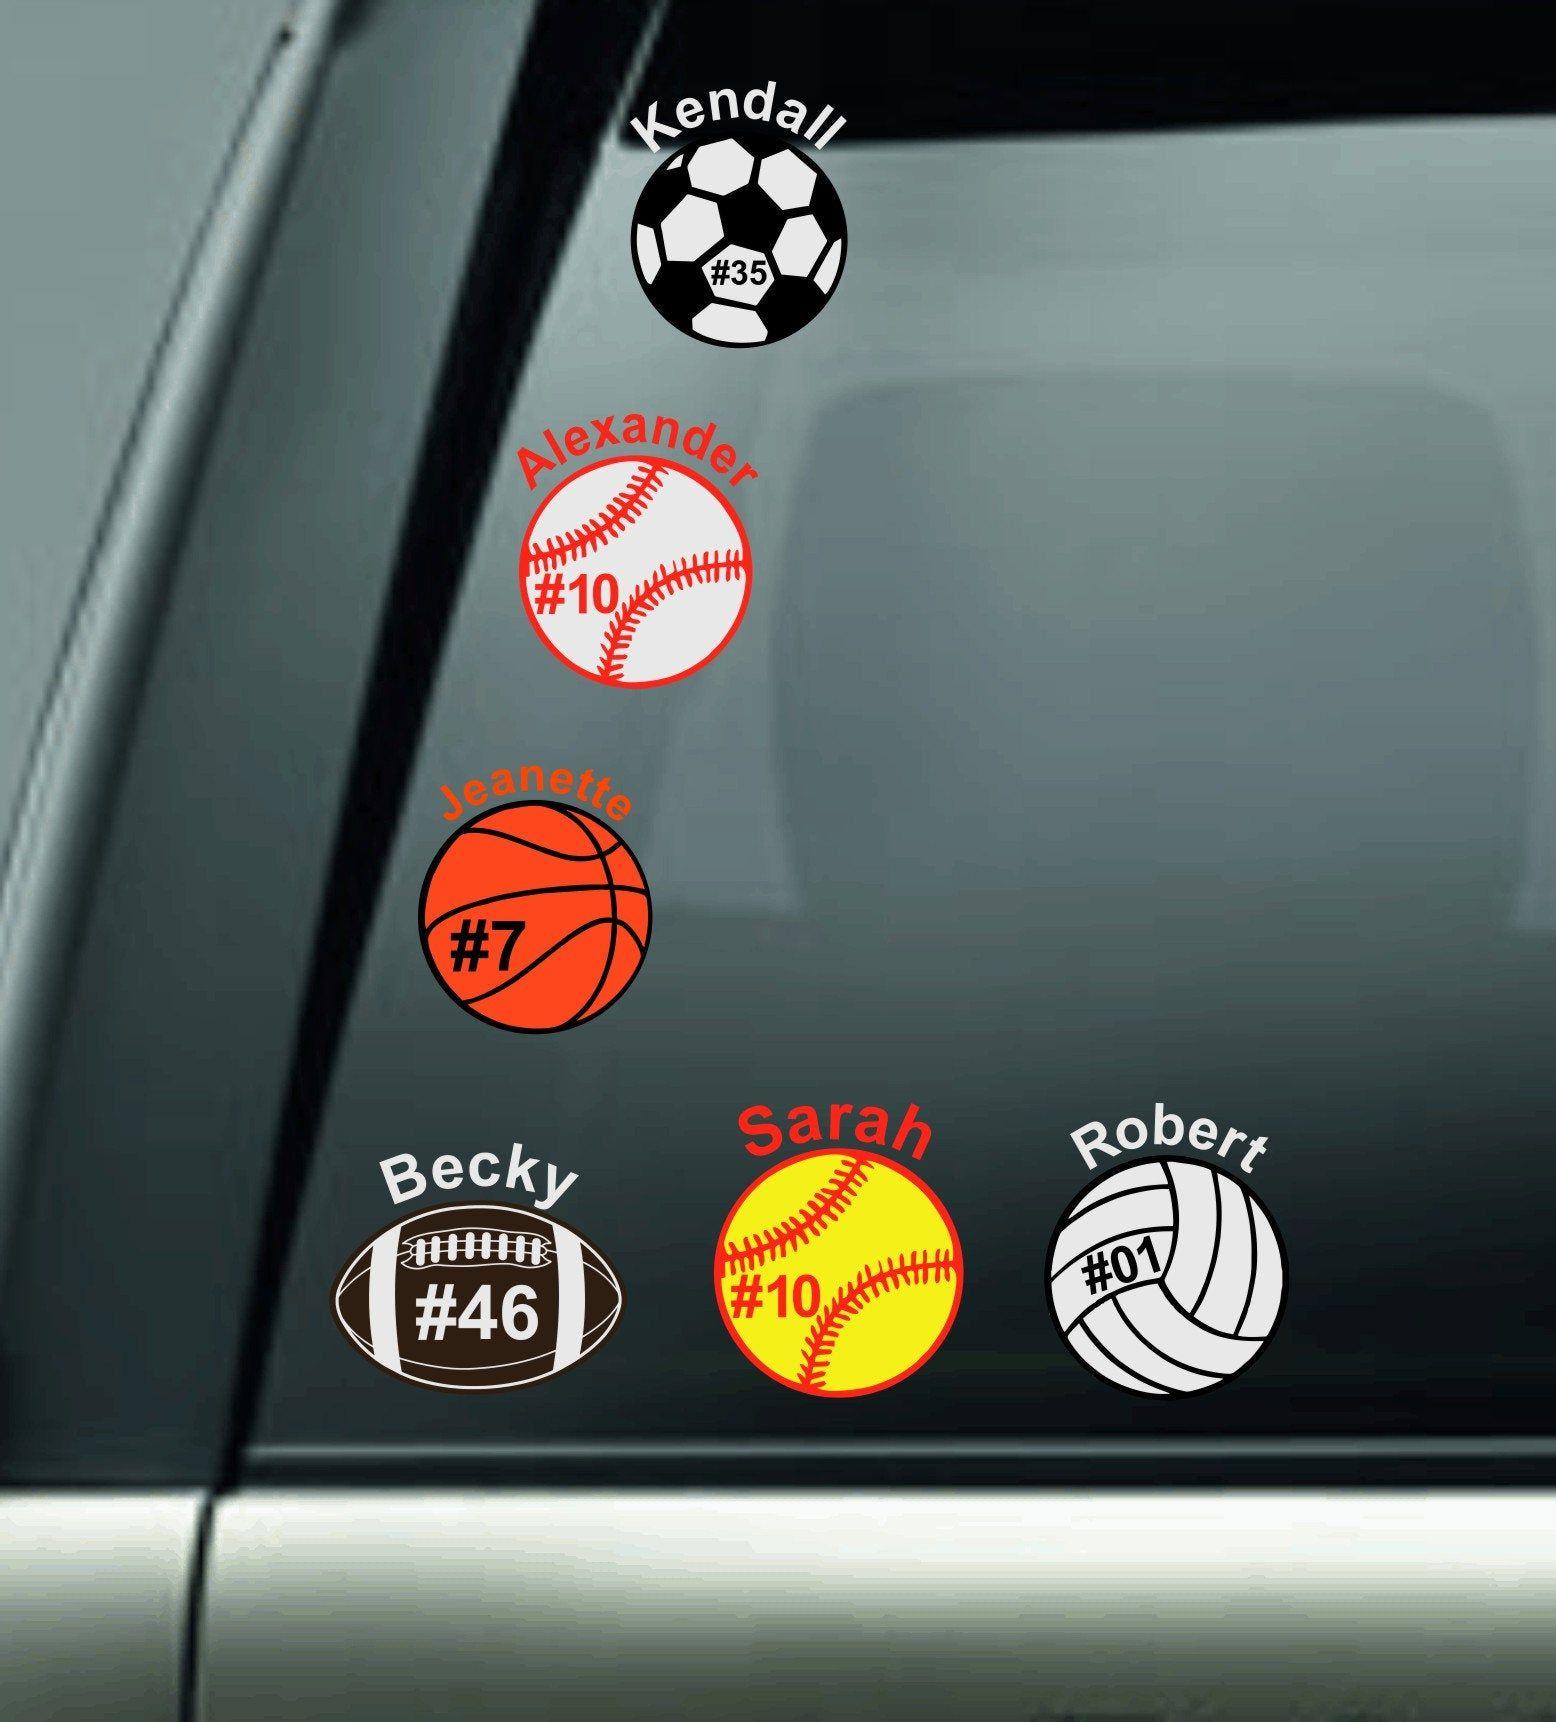 Personalized Vinyl Car Decal Baseball Softball Football Basketball Volleyball Soccer Tennis Decal Stic Car Decals Vinyl Soccer Vinyl Decal Car Decals Stickers [ 1722 x 1556 Pixel ]